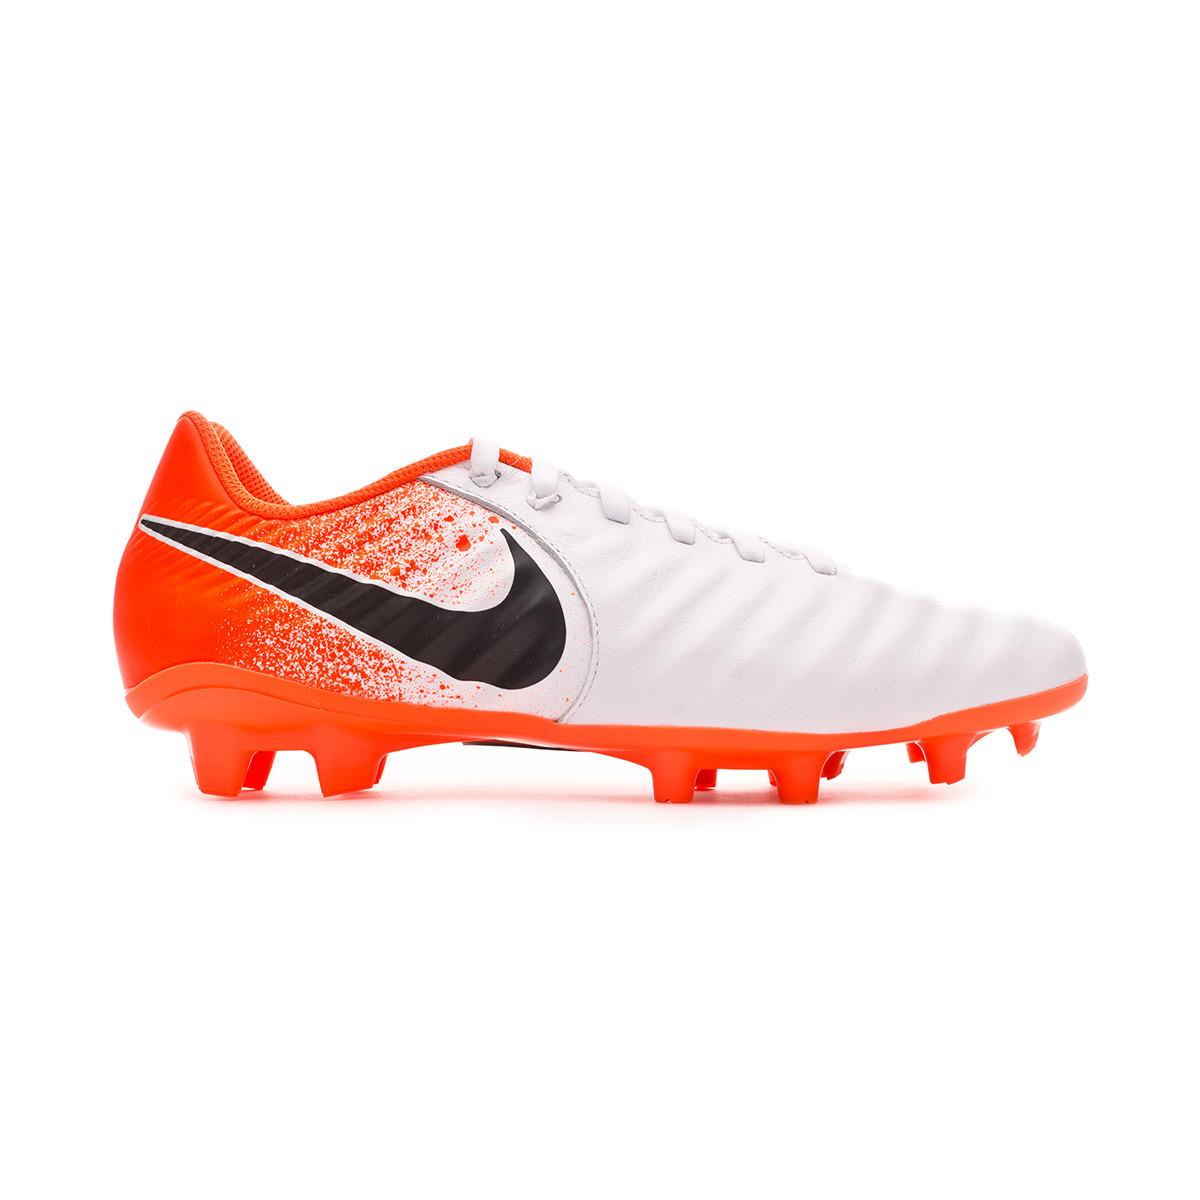 e1b3c02d047 Football Boots Nike Tiempo Legend VII Academy FG White-Black-Hyper crimson  - Football store Fútbol Emotion